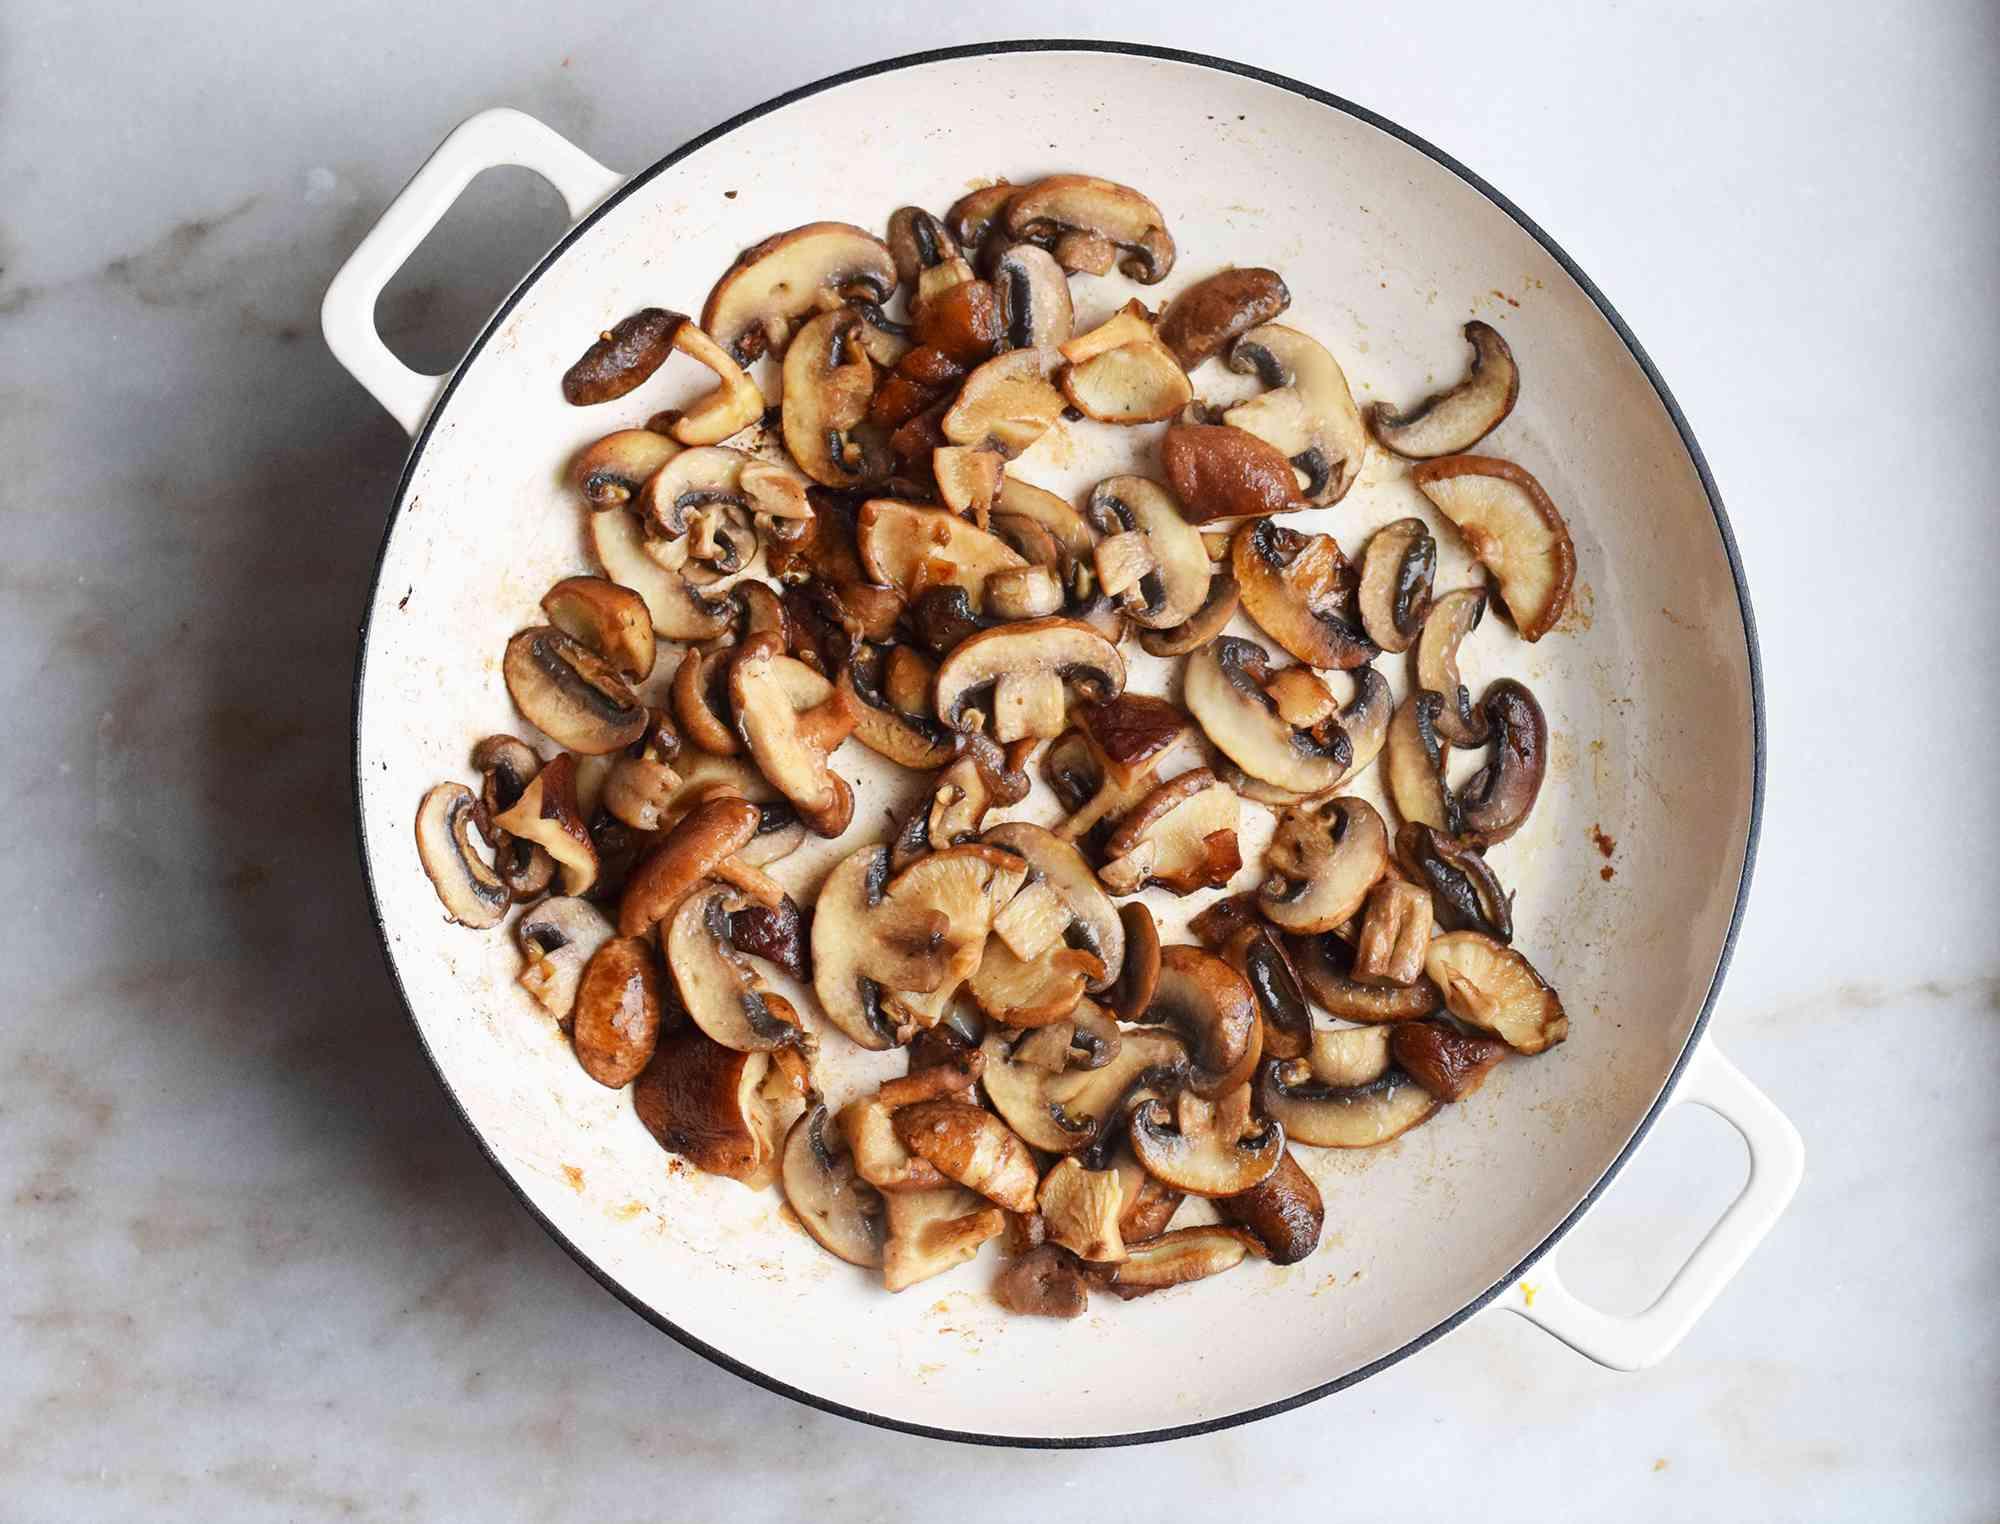 mushrooms sauteed in a saute pan